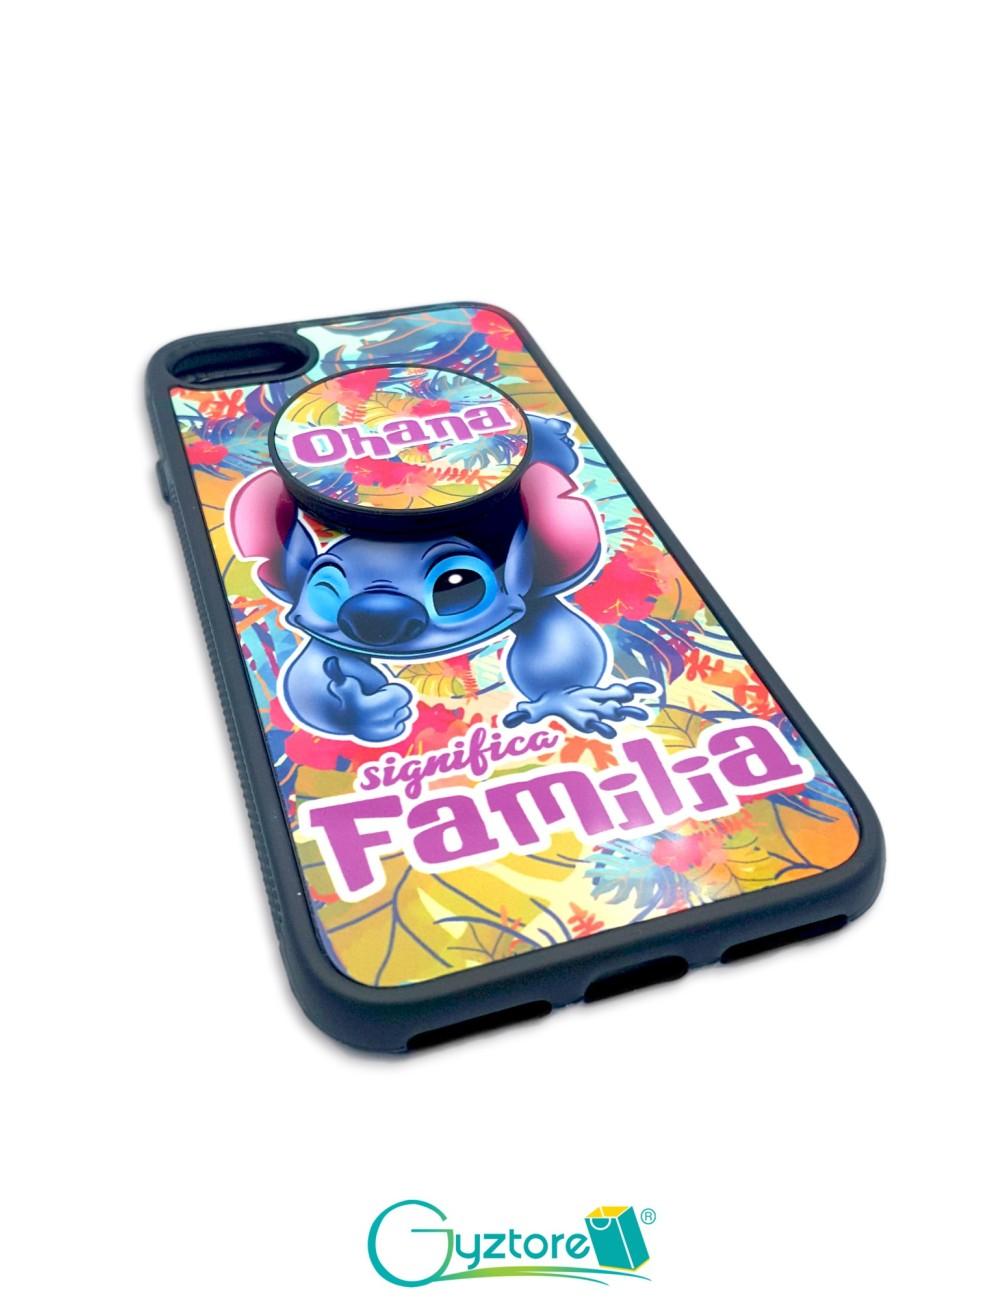 Estuche para celular diseño Stitch